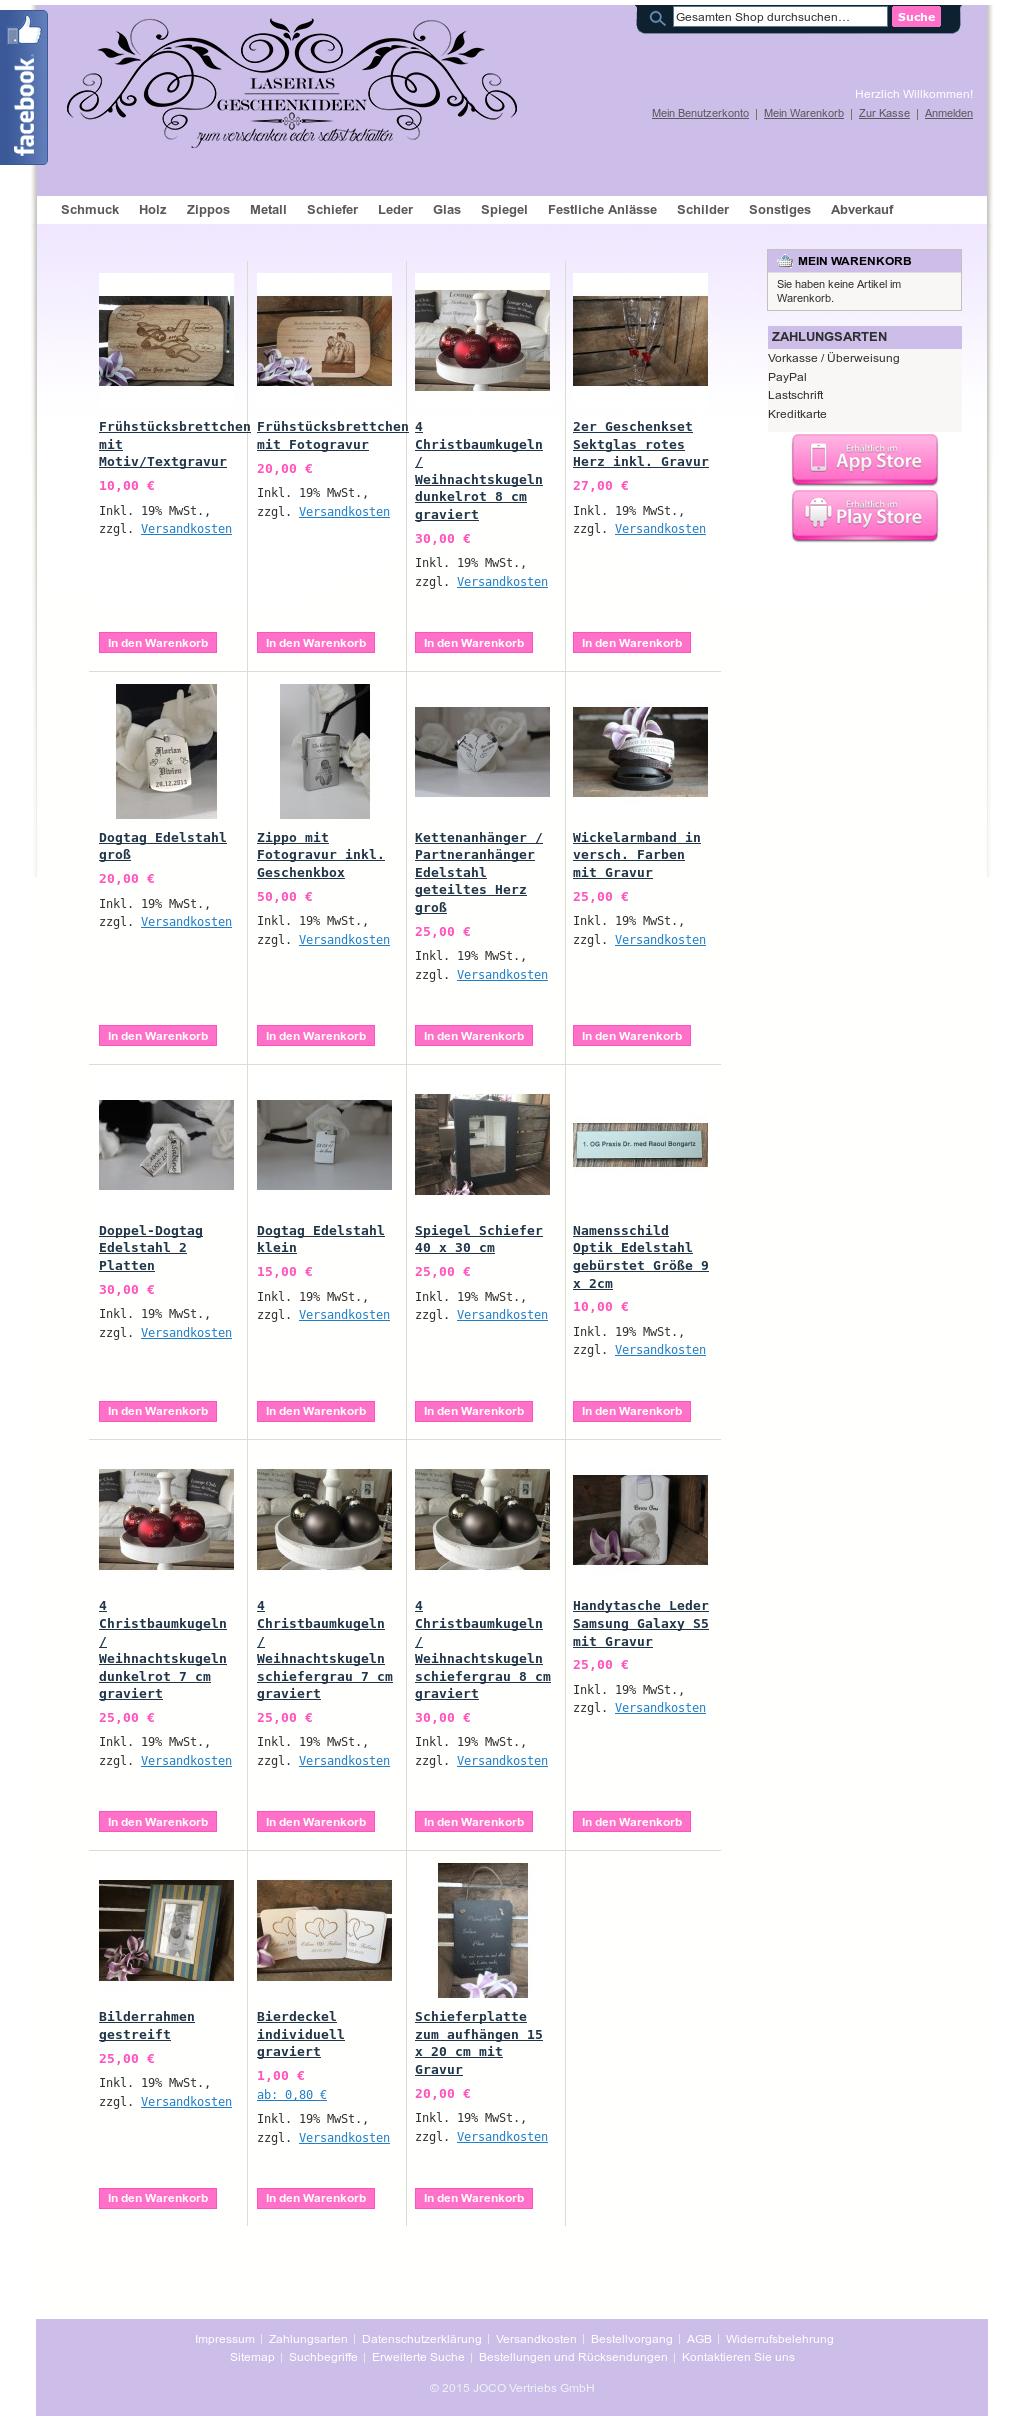 Christbaumkugeln Magenta.Laseria De Competitors Revenue And Employees Owler Company Profile